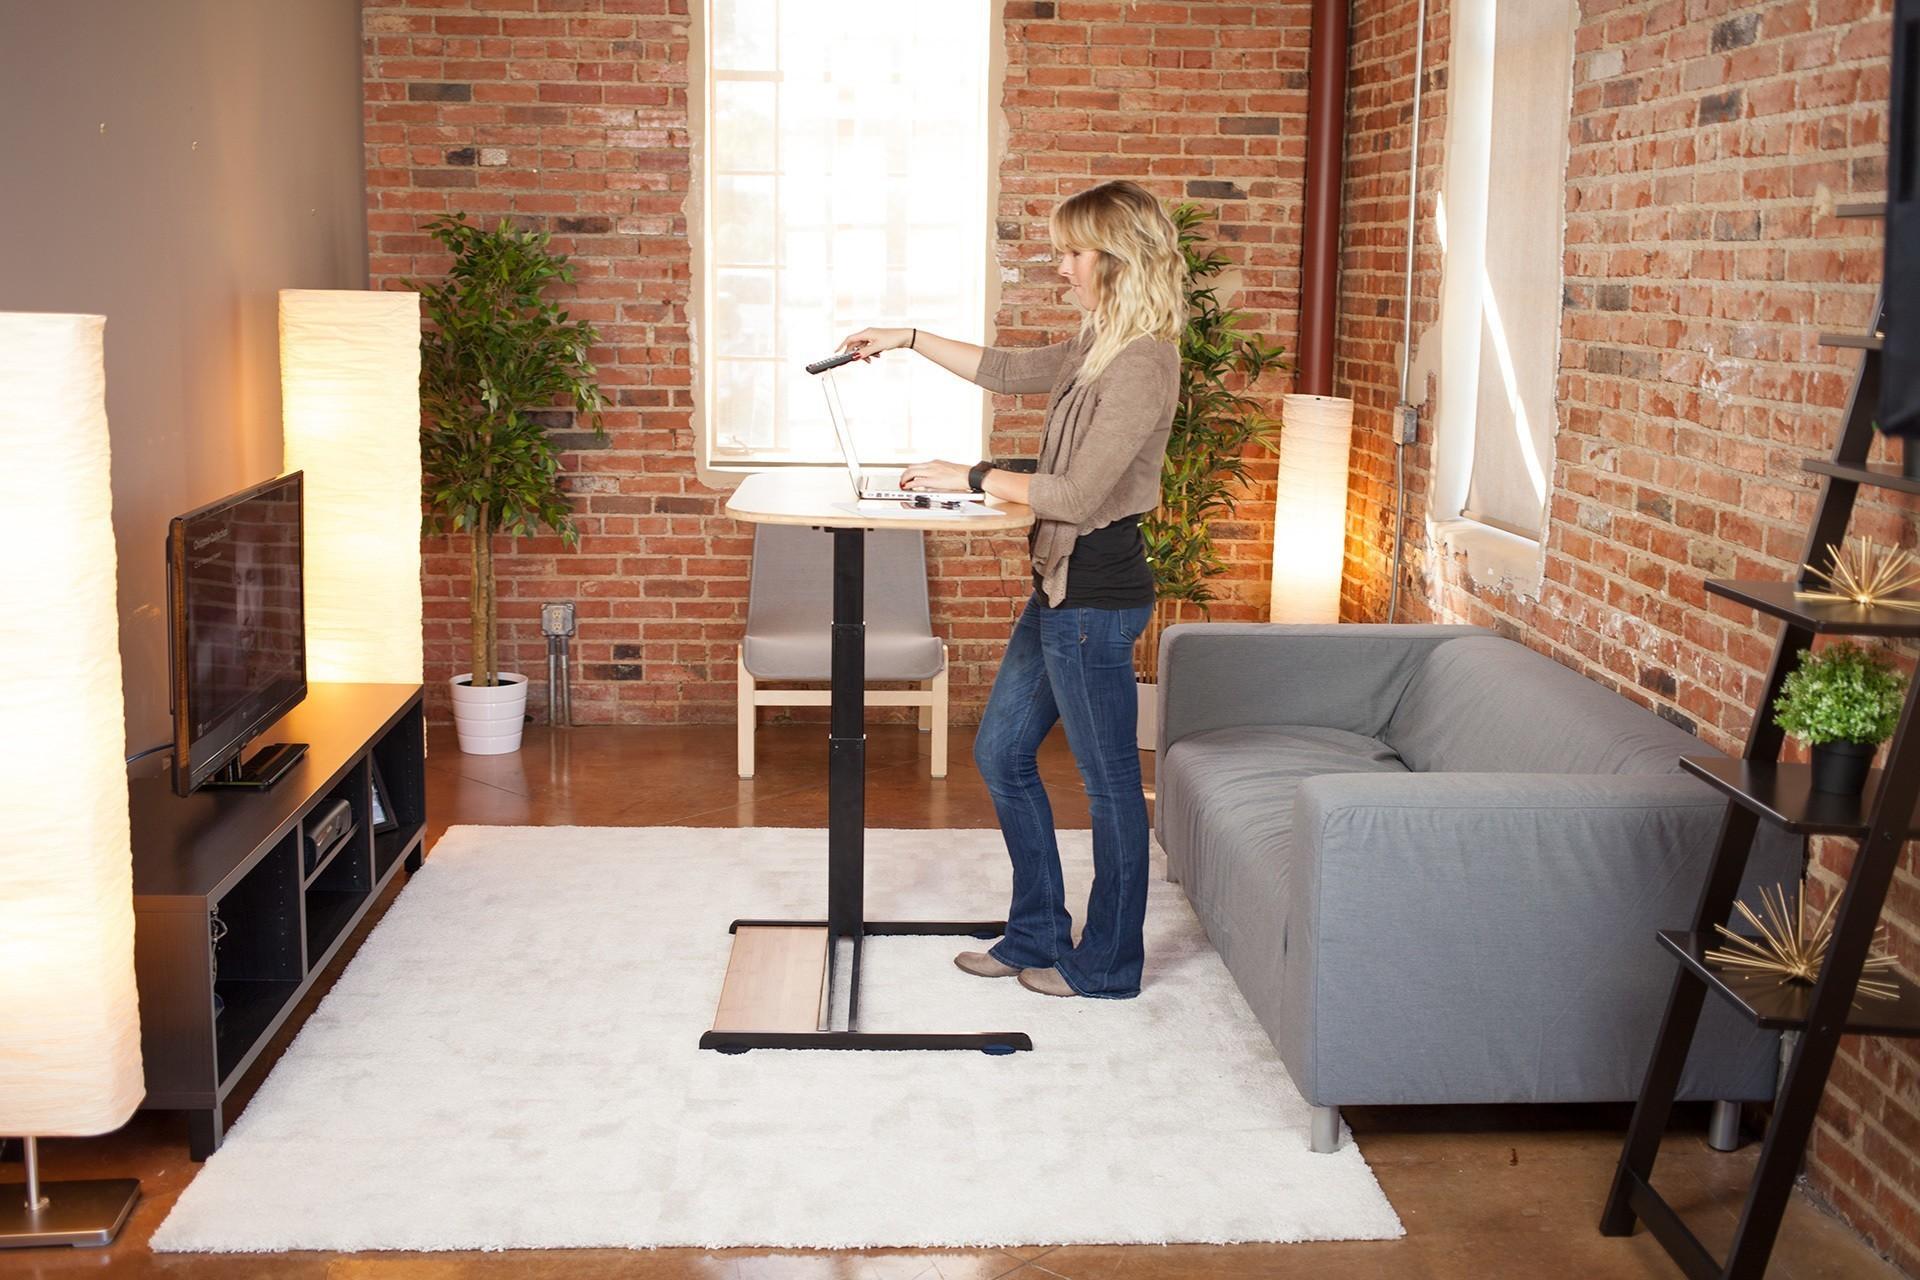 This desk was designed for the multi-tasker